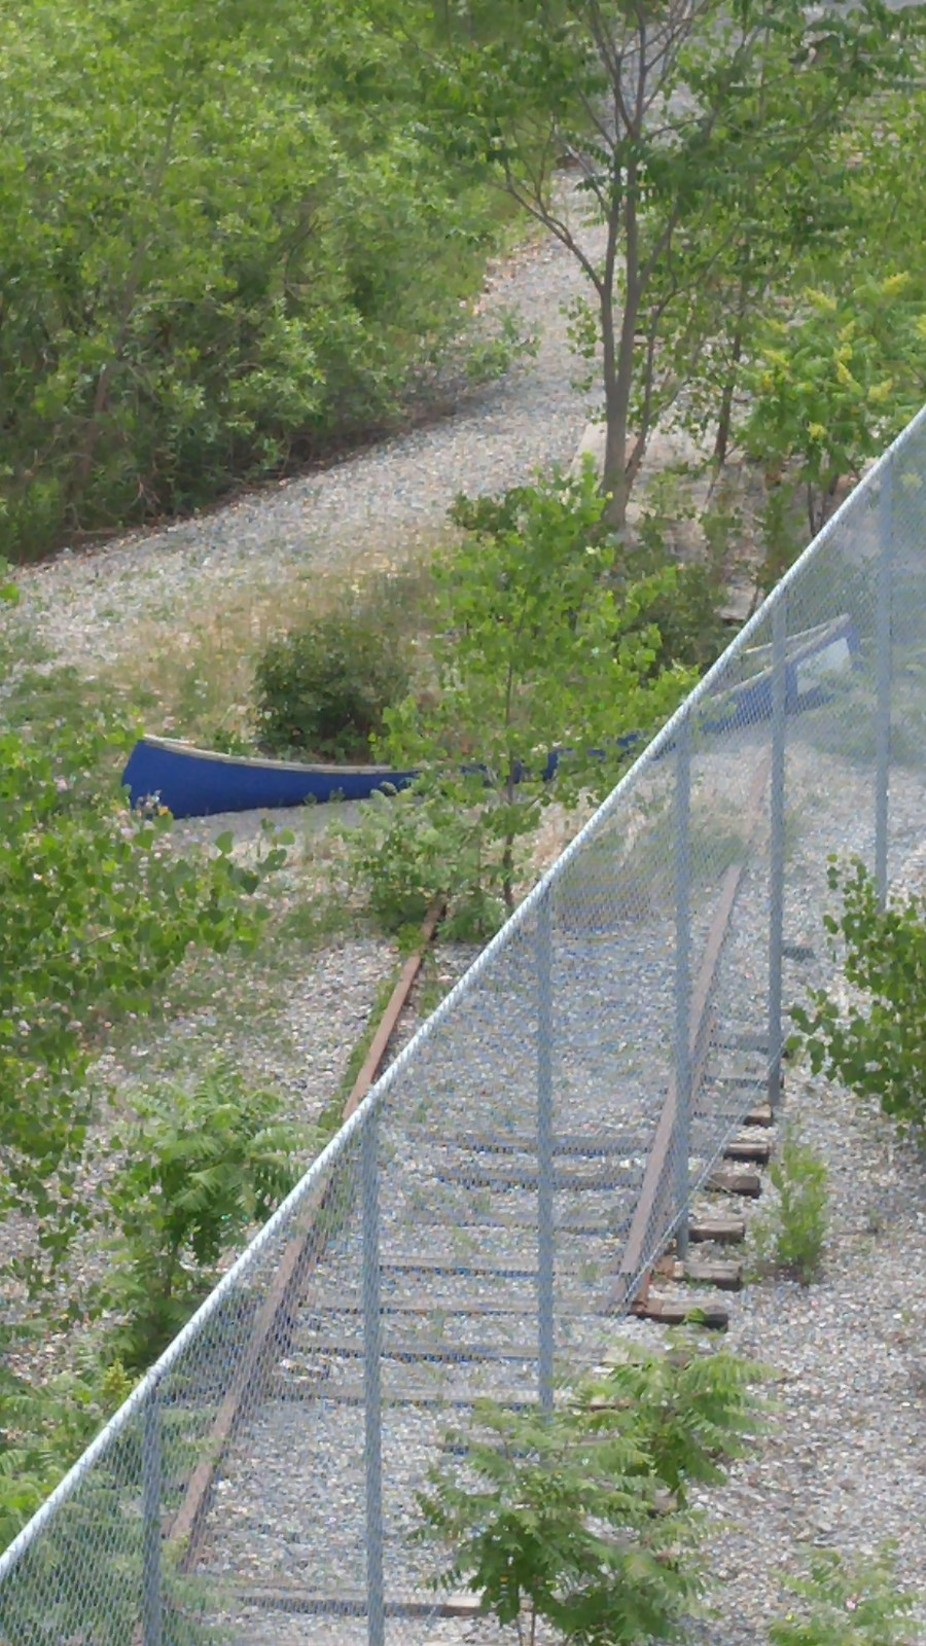 Canoe on the tracks